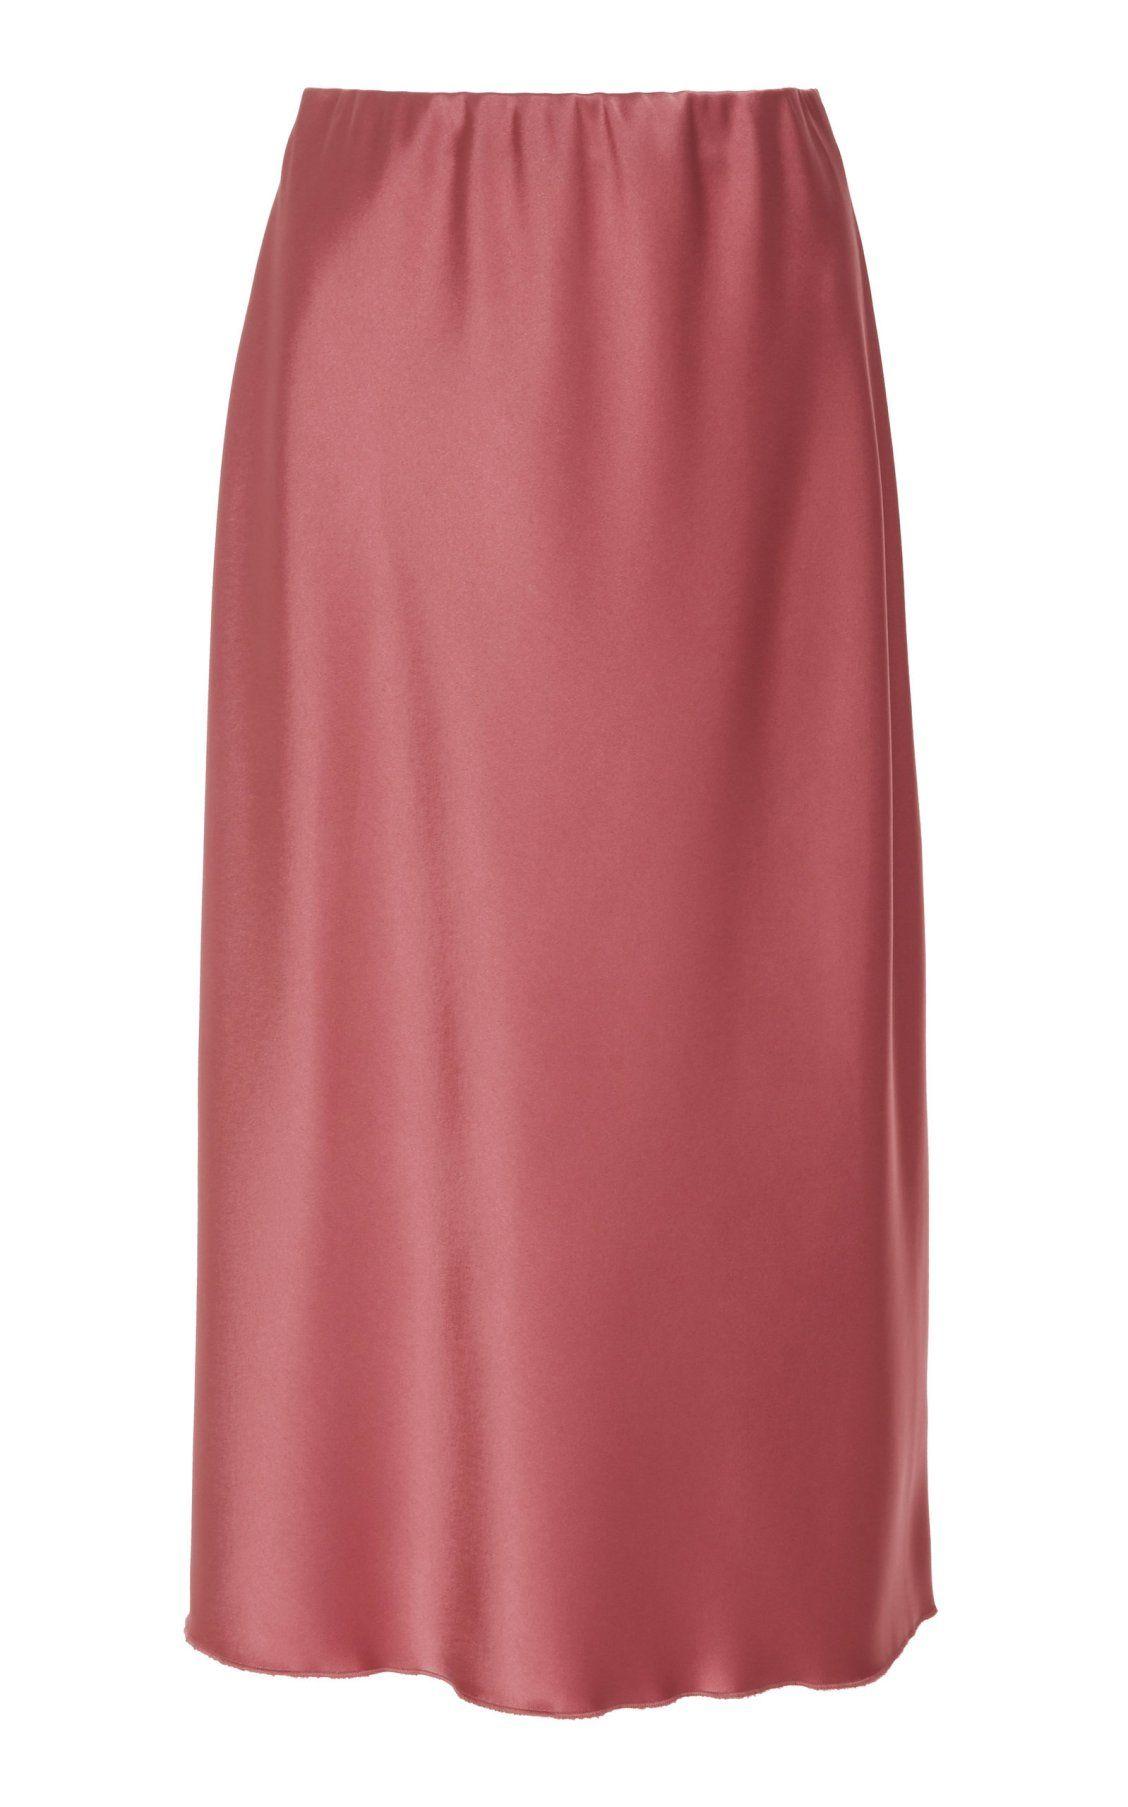 859e1486b8 Zarina High Waisted Satin Midi Skirt by Nanushka PF19 | Moda Operandi